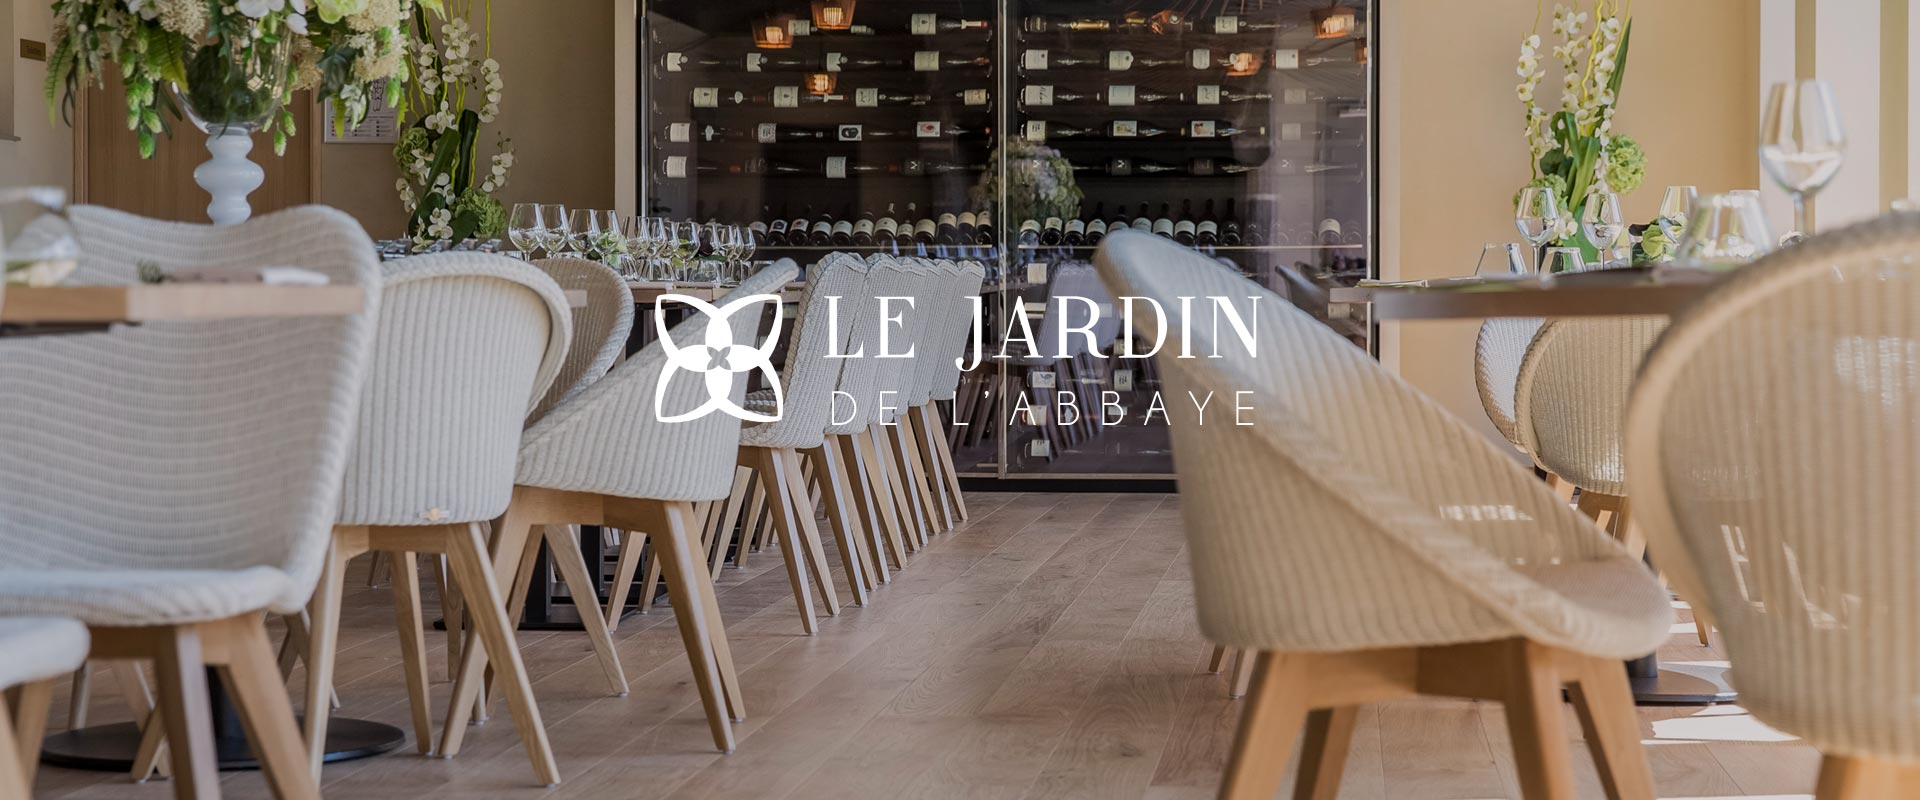 Restaurant le jardin de l 39 abbaye hotel restaurant st malo for Restaurant le jardin montmorency